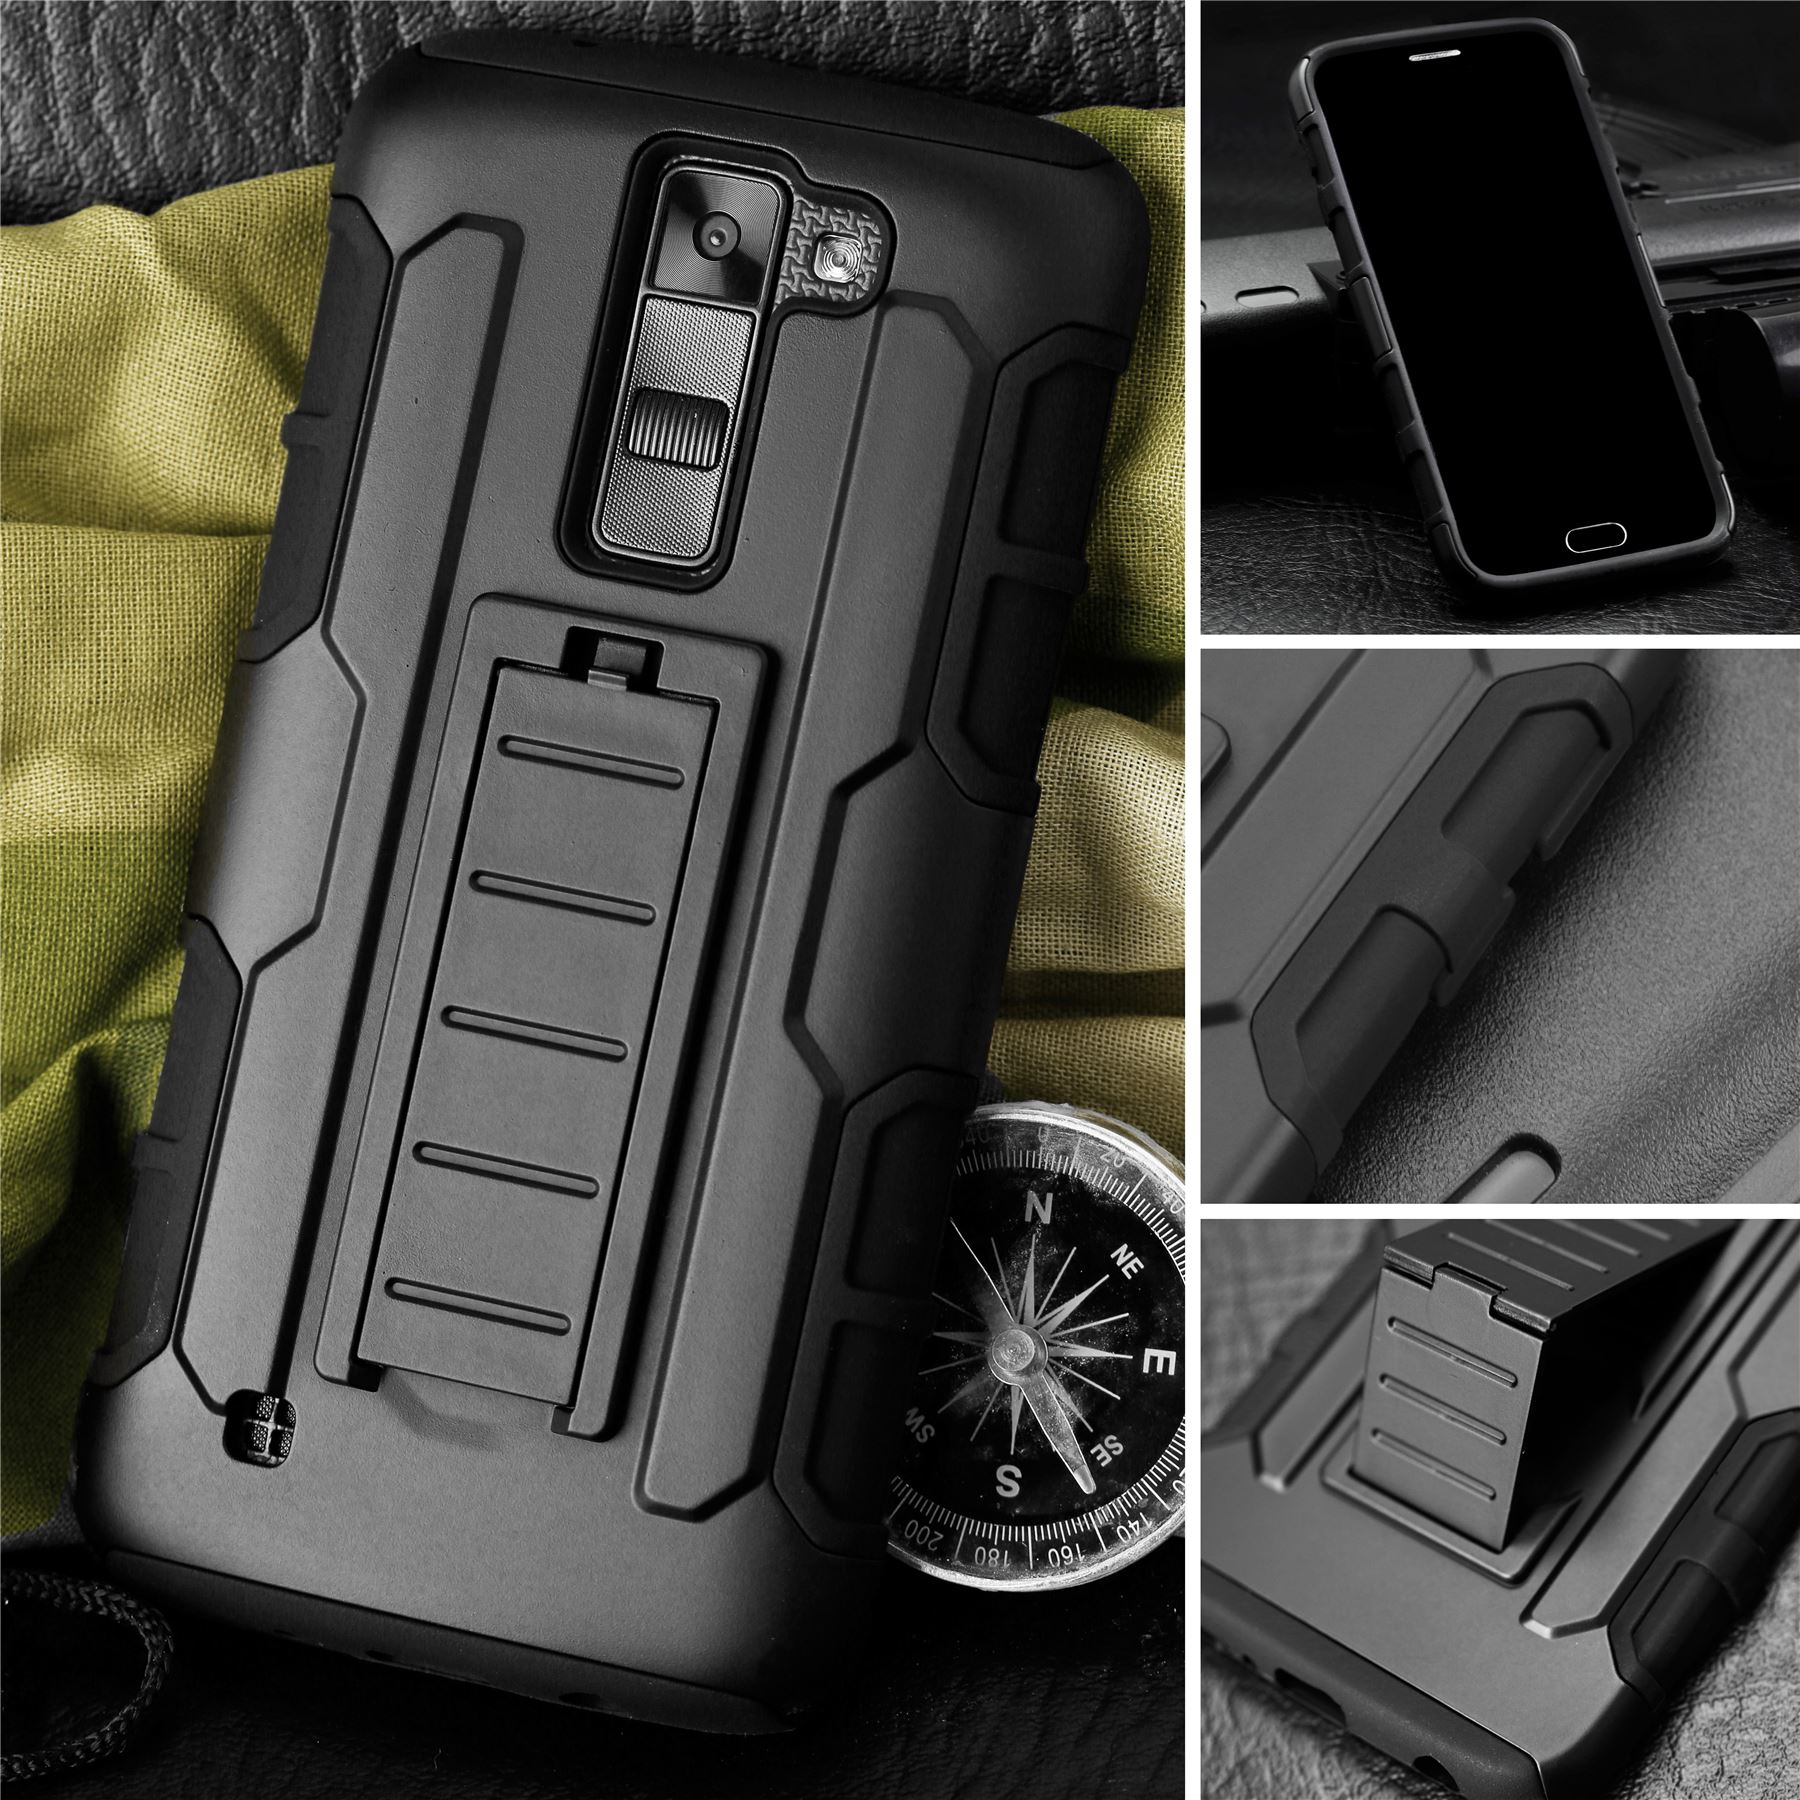 Resistente-Carcasa-Dura-Protectora-Para-Moviles-Funda-de-blindaje-futurista-LG